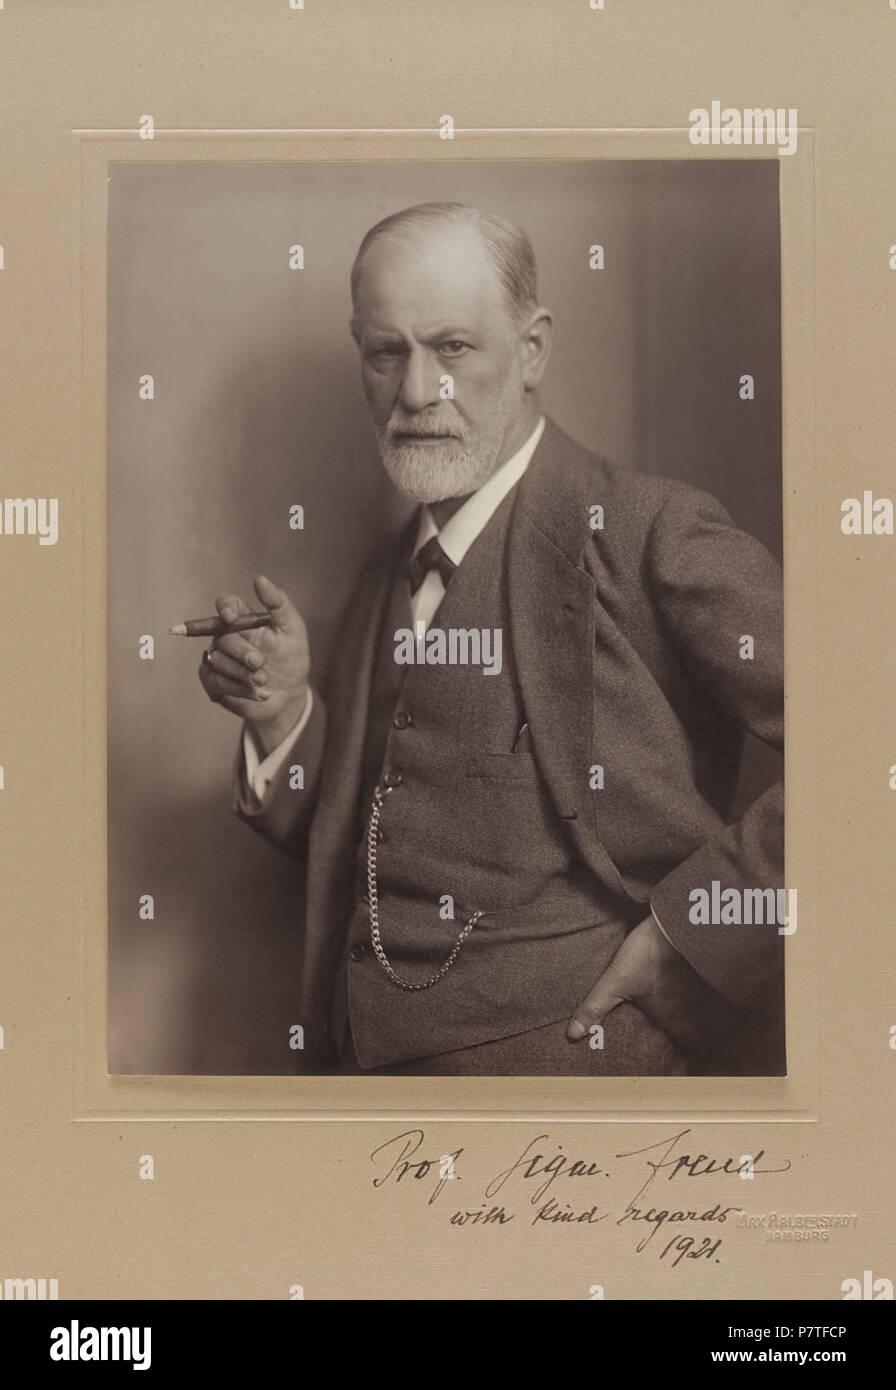 English: Photographic portrait of Sigmund Freud, signed by the sitter ('Prof. Sigmund Freud') . circa 1921 346 Sigmund Freud, by Max Halberstadt - Stock Image